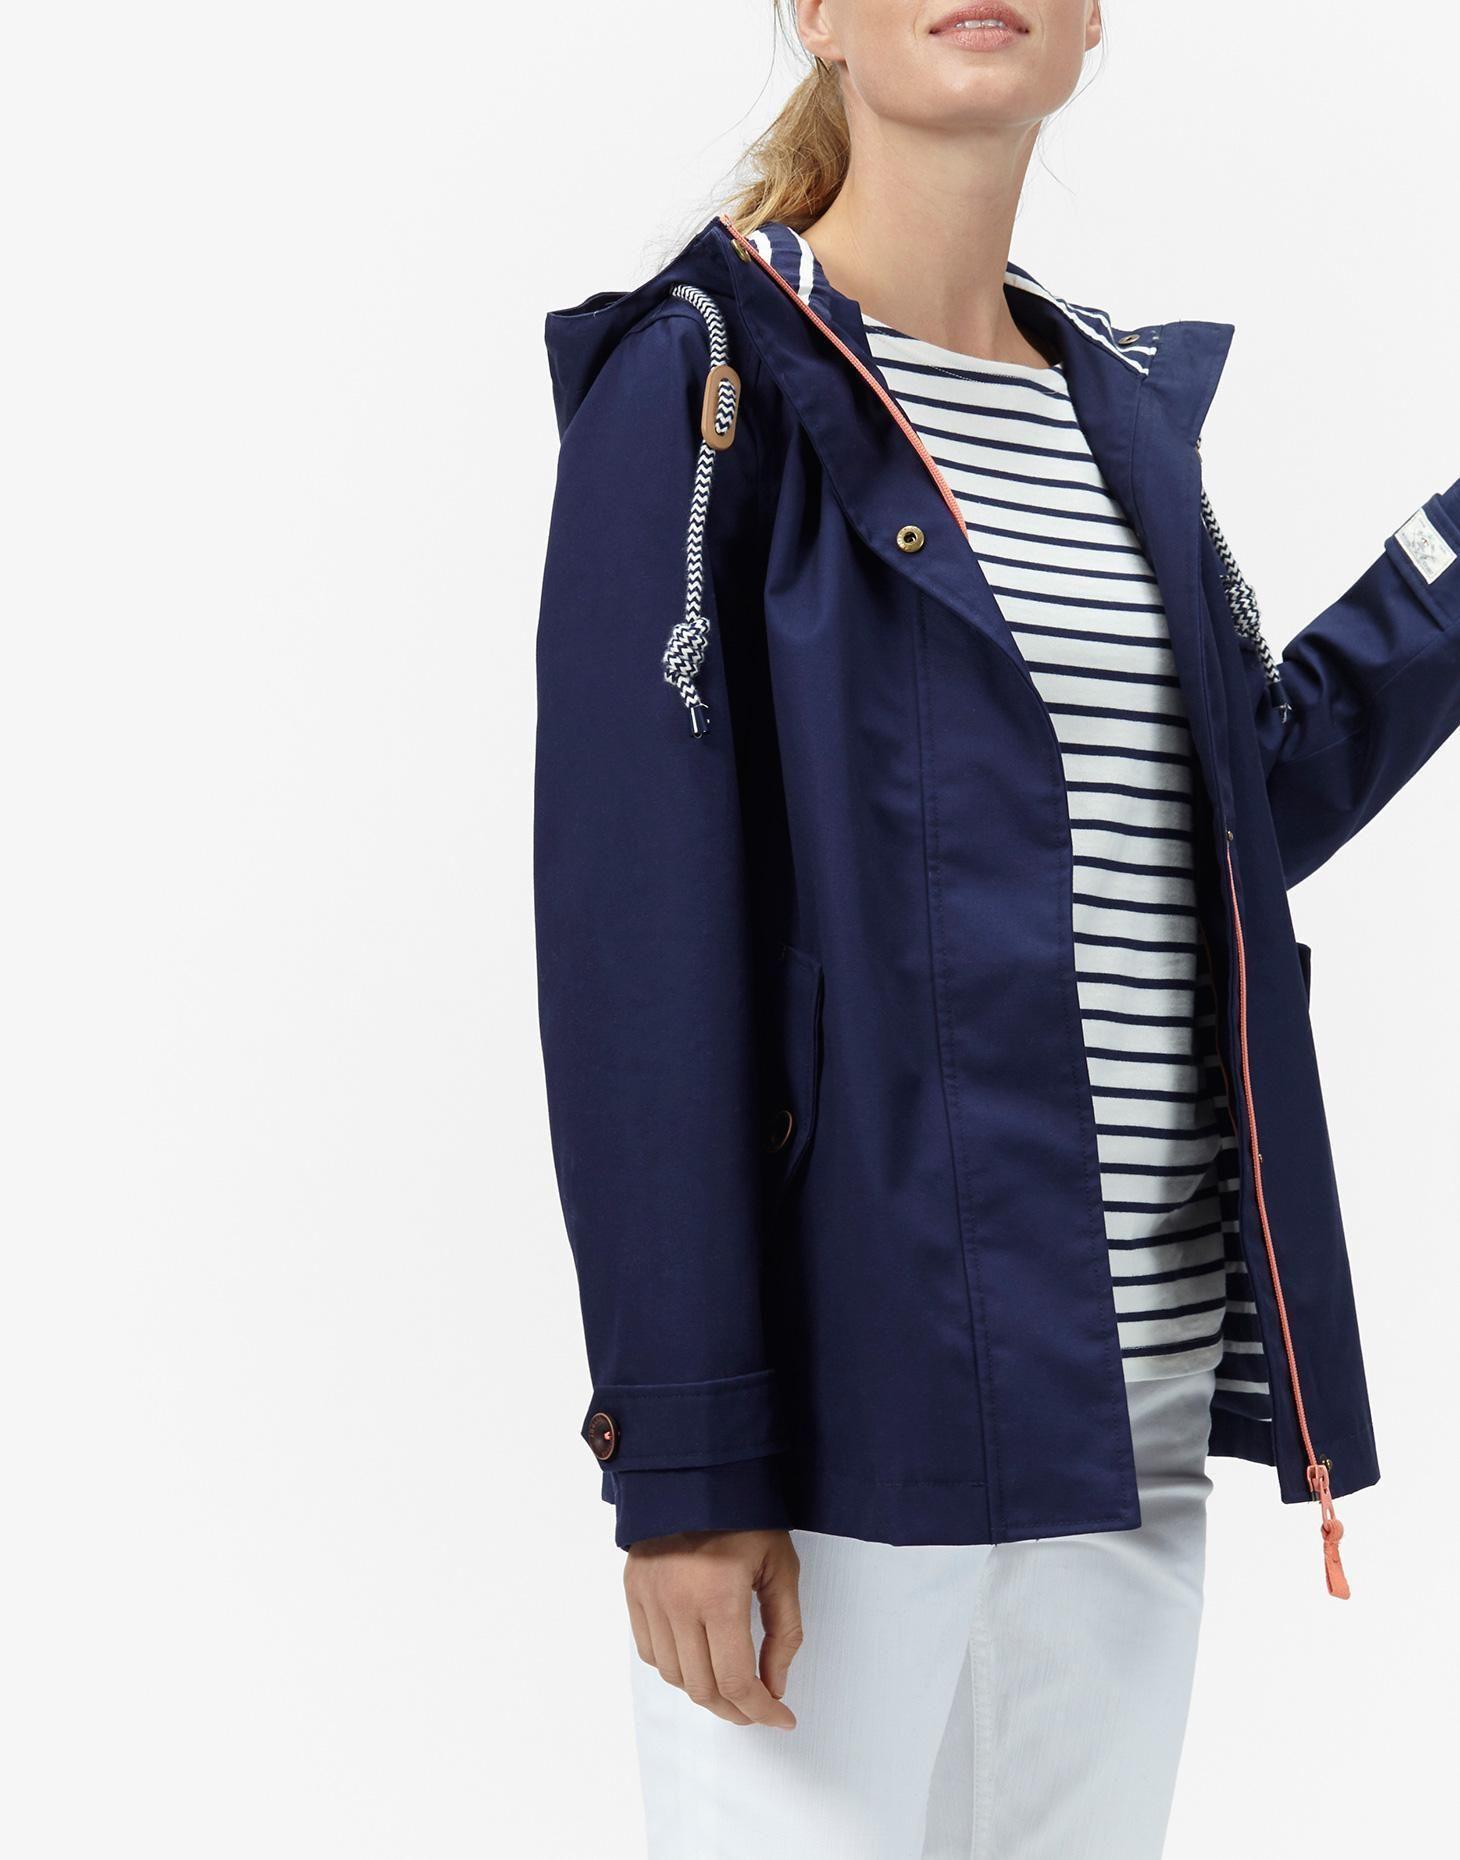 Coast French Navy Waterproof Hooded Jacket | Joules US | Coats ...